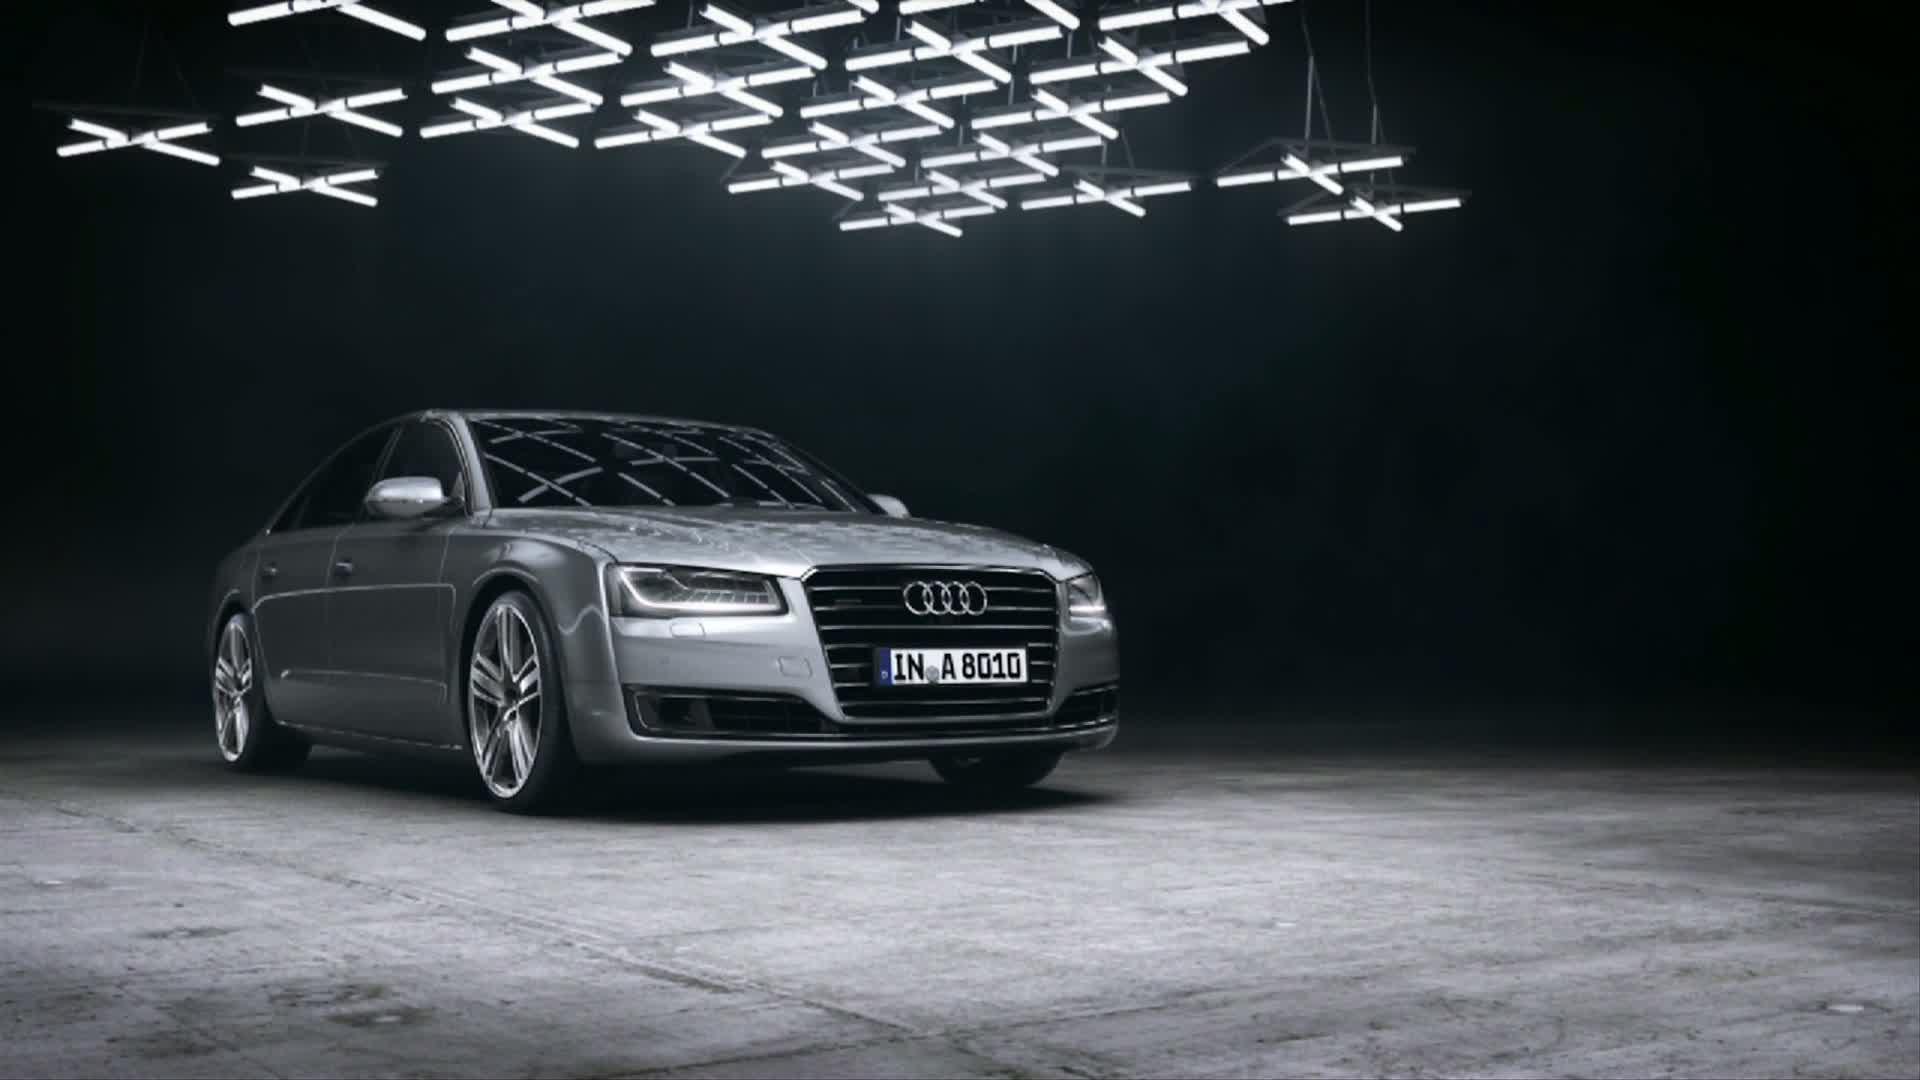 The Audi A8 with Matrix LED headlights